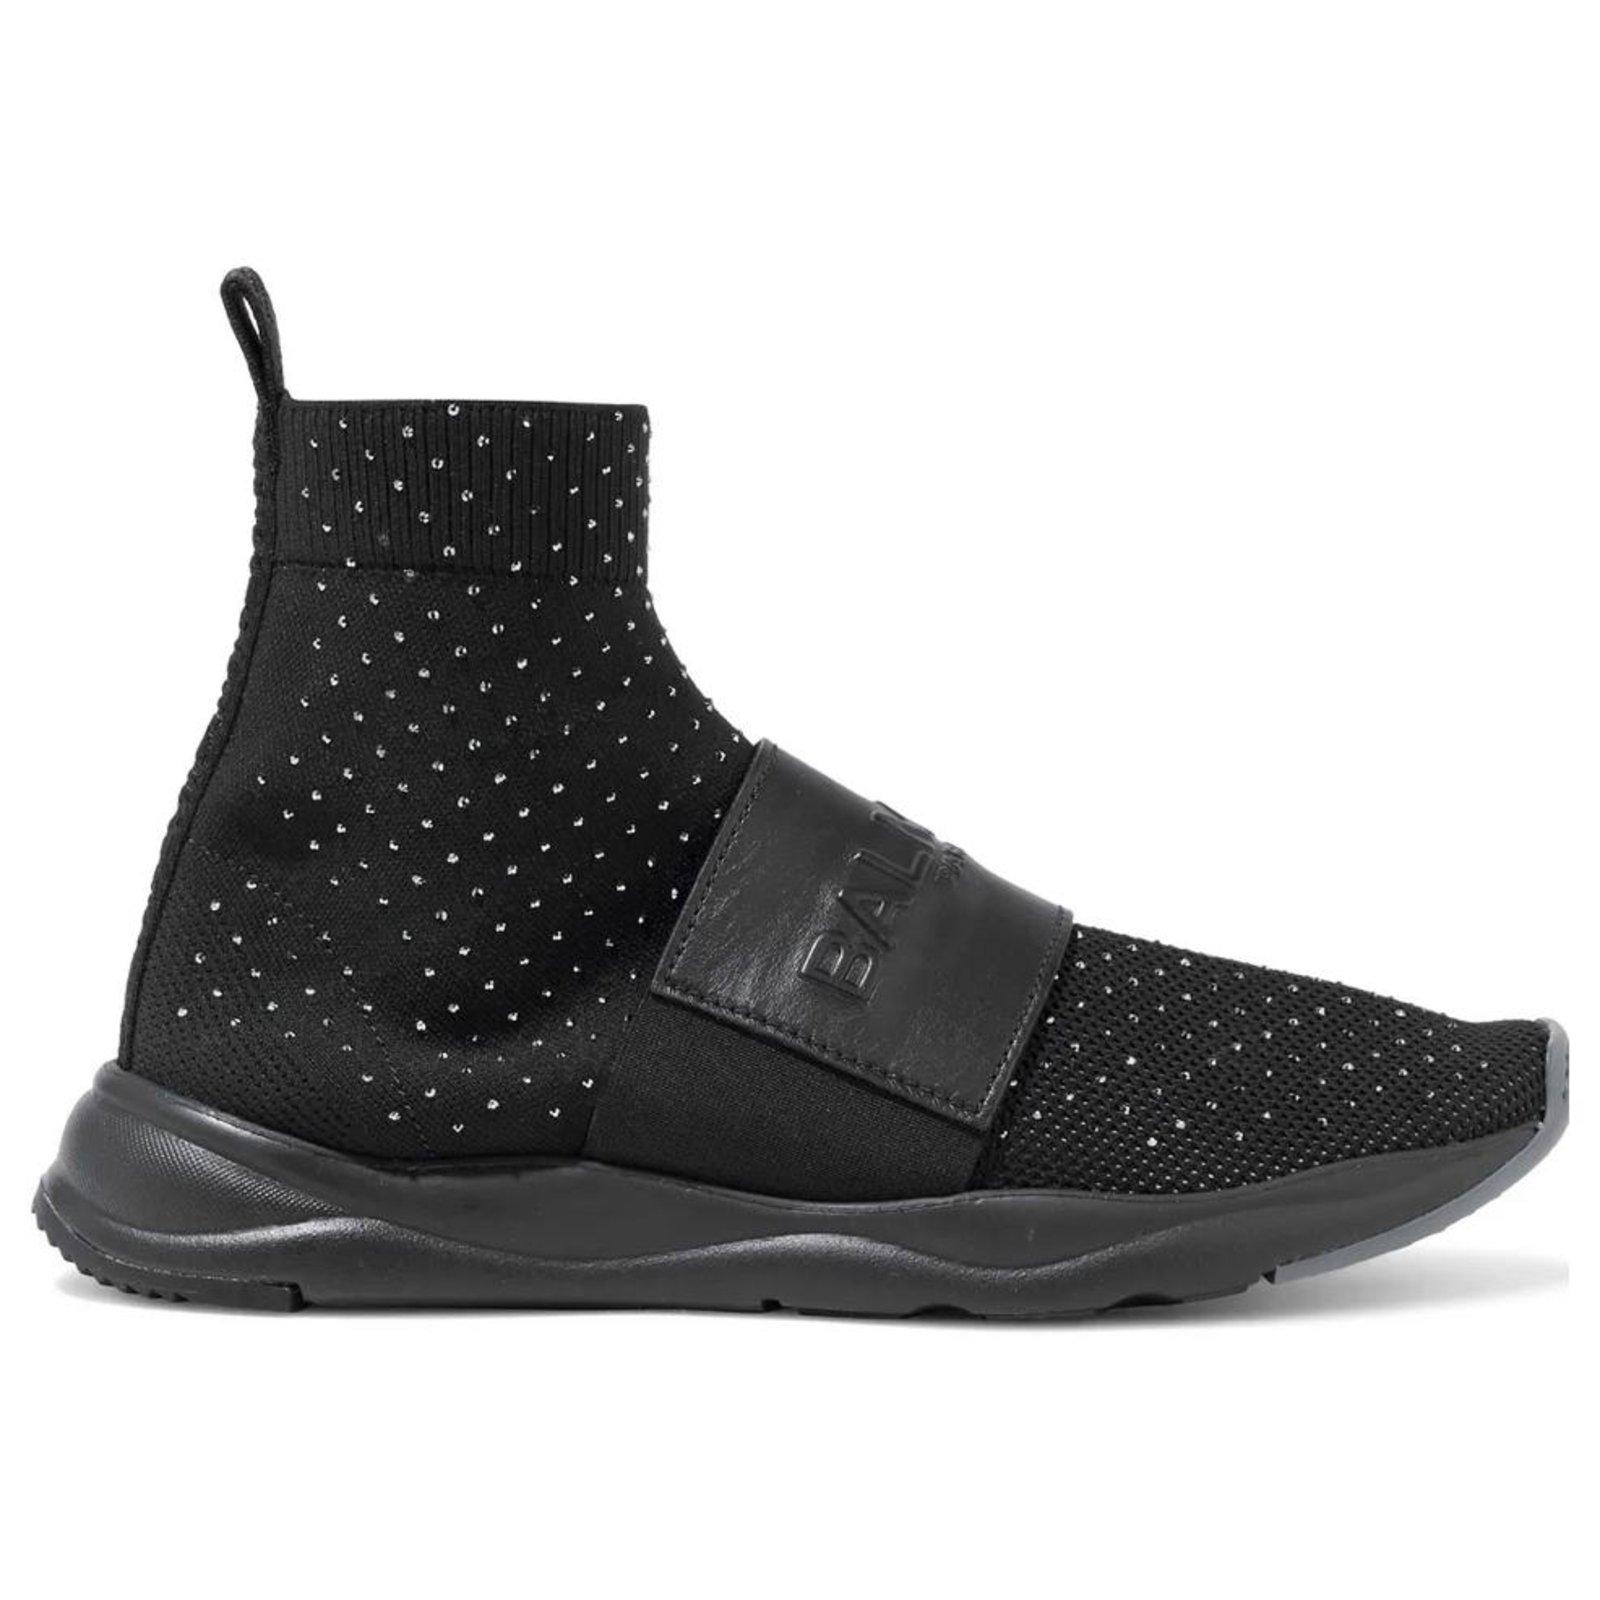 Balmain Cameron Sneakers Leather Black